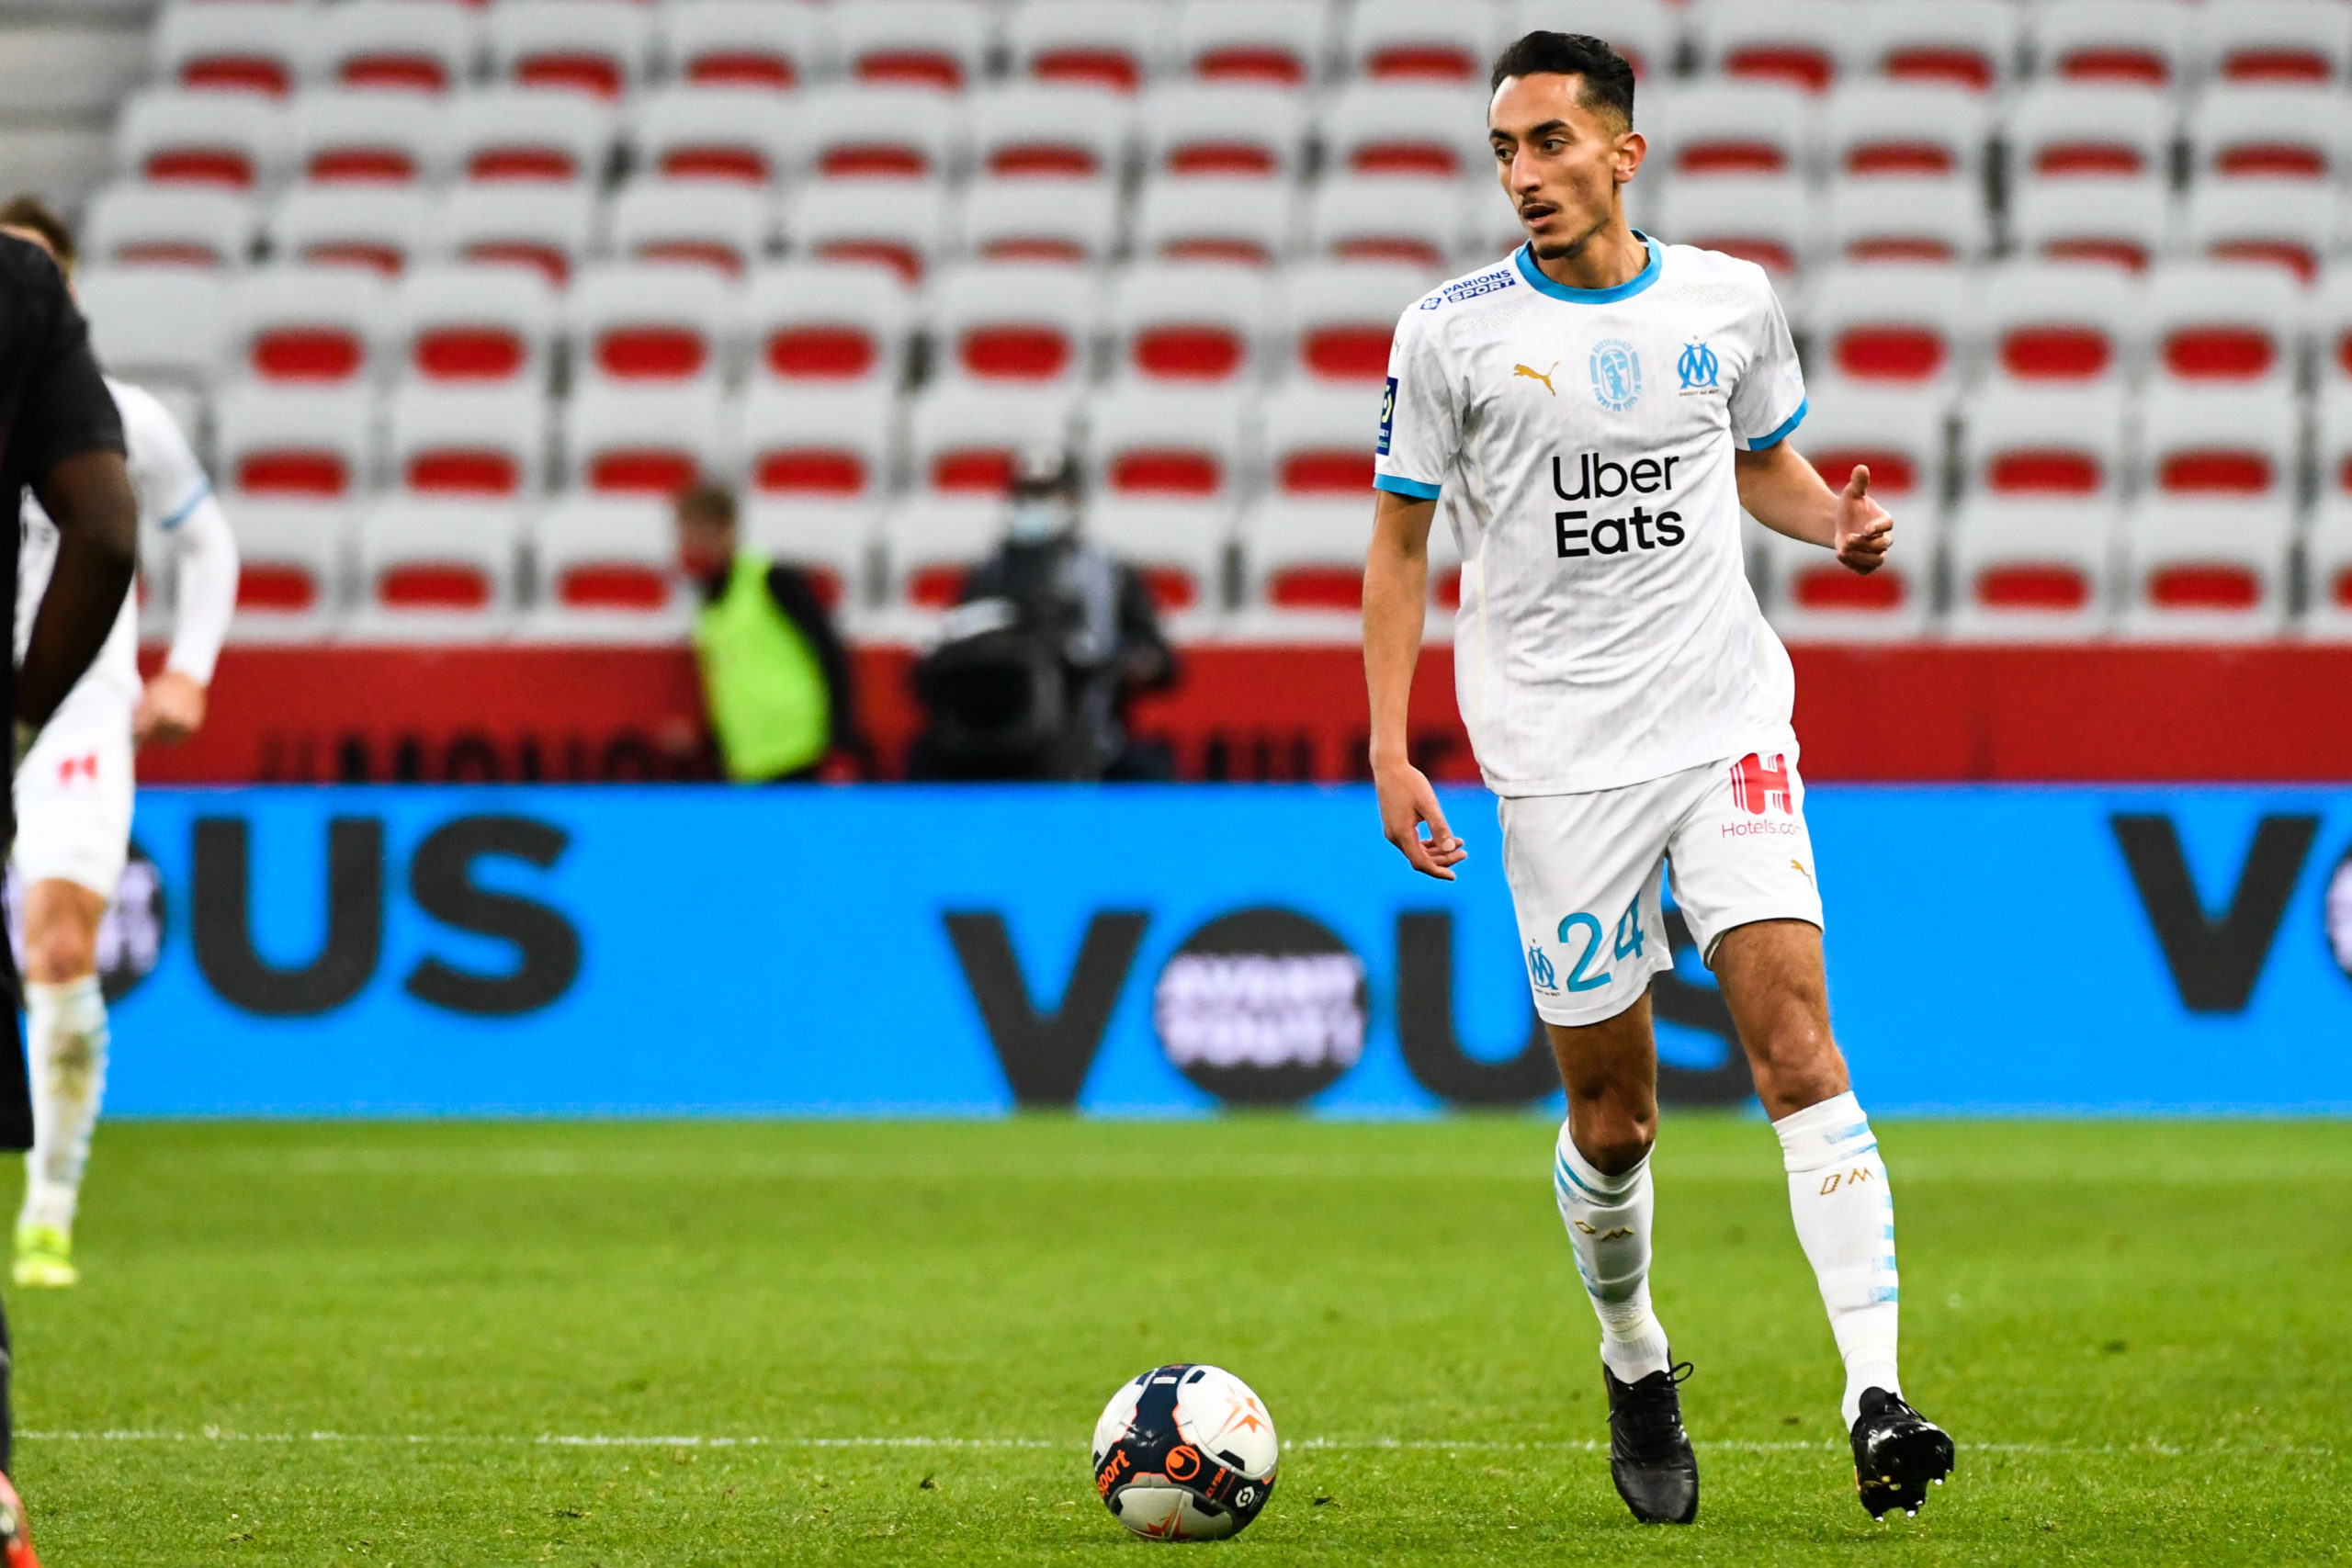 Mercato OM : Saïf Eddine Khaoui pourrait rebondir en Ligue 1